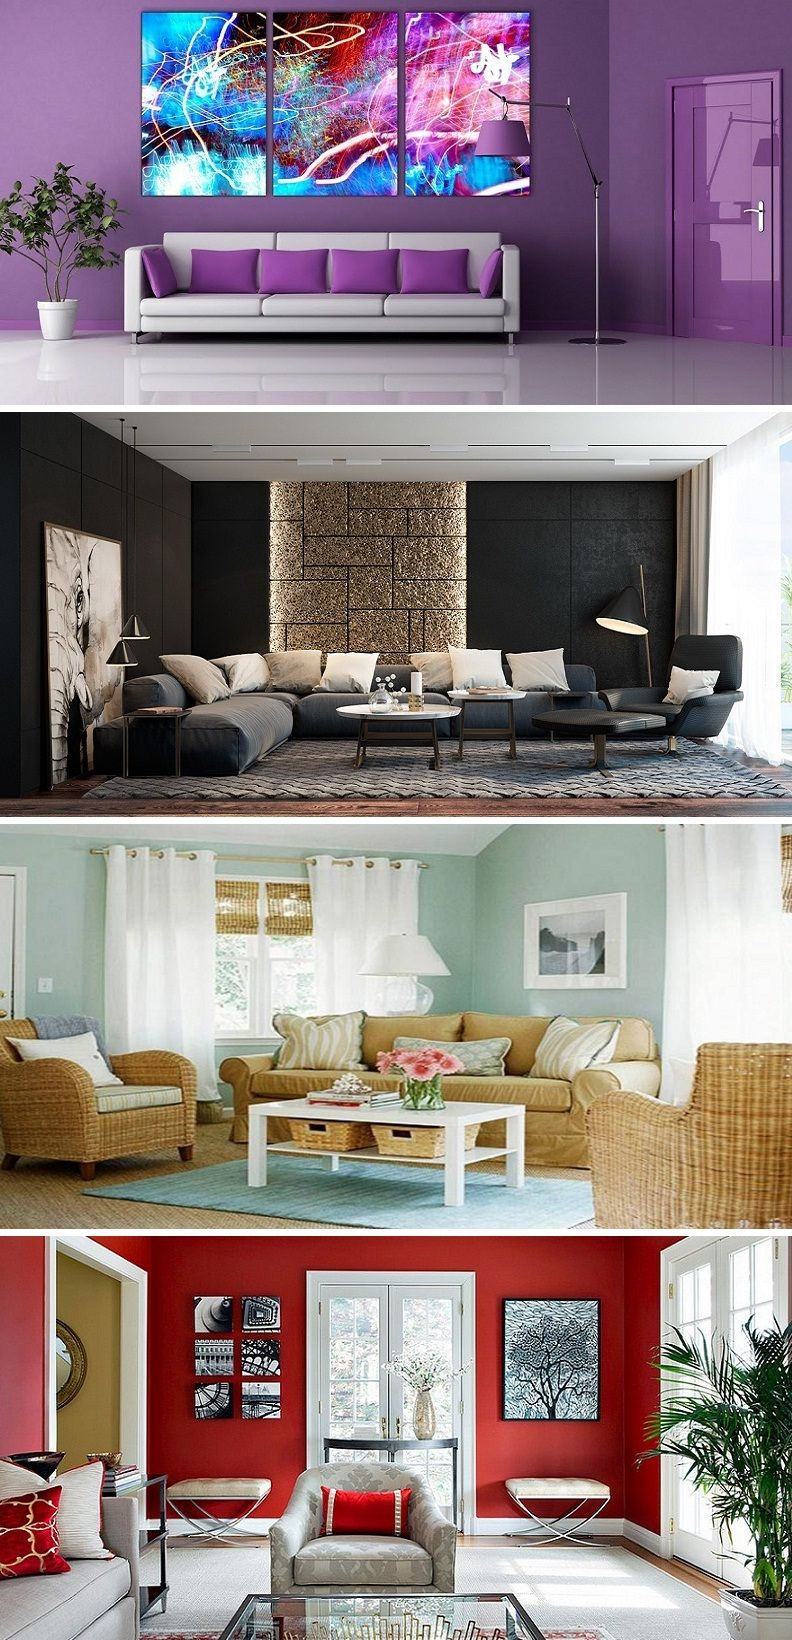 home color design interior interiordesign interiorideas on interior house color ideas id=96417